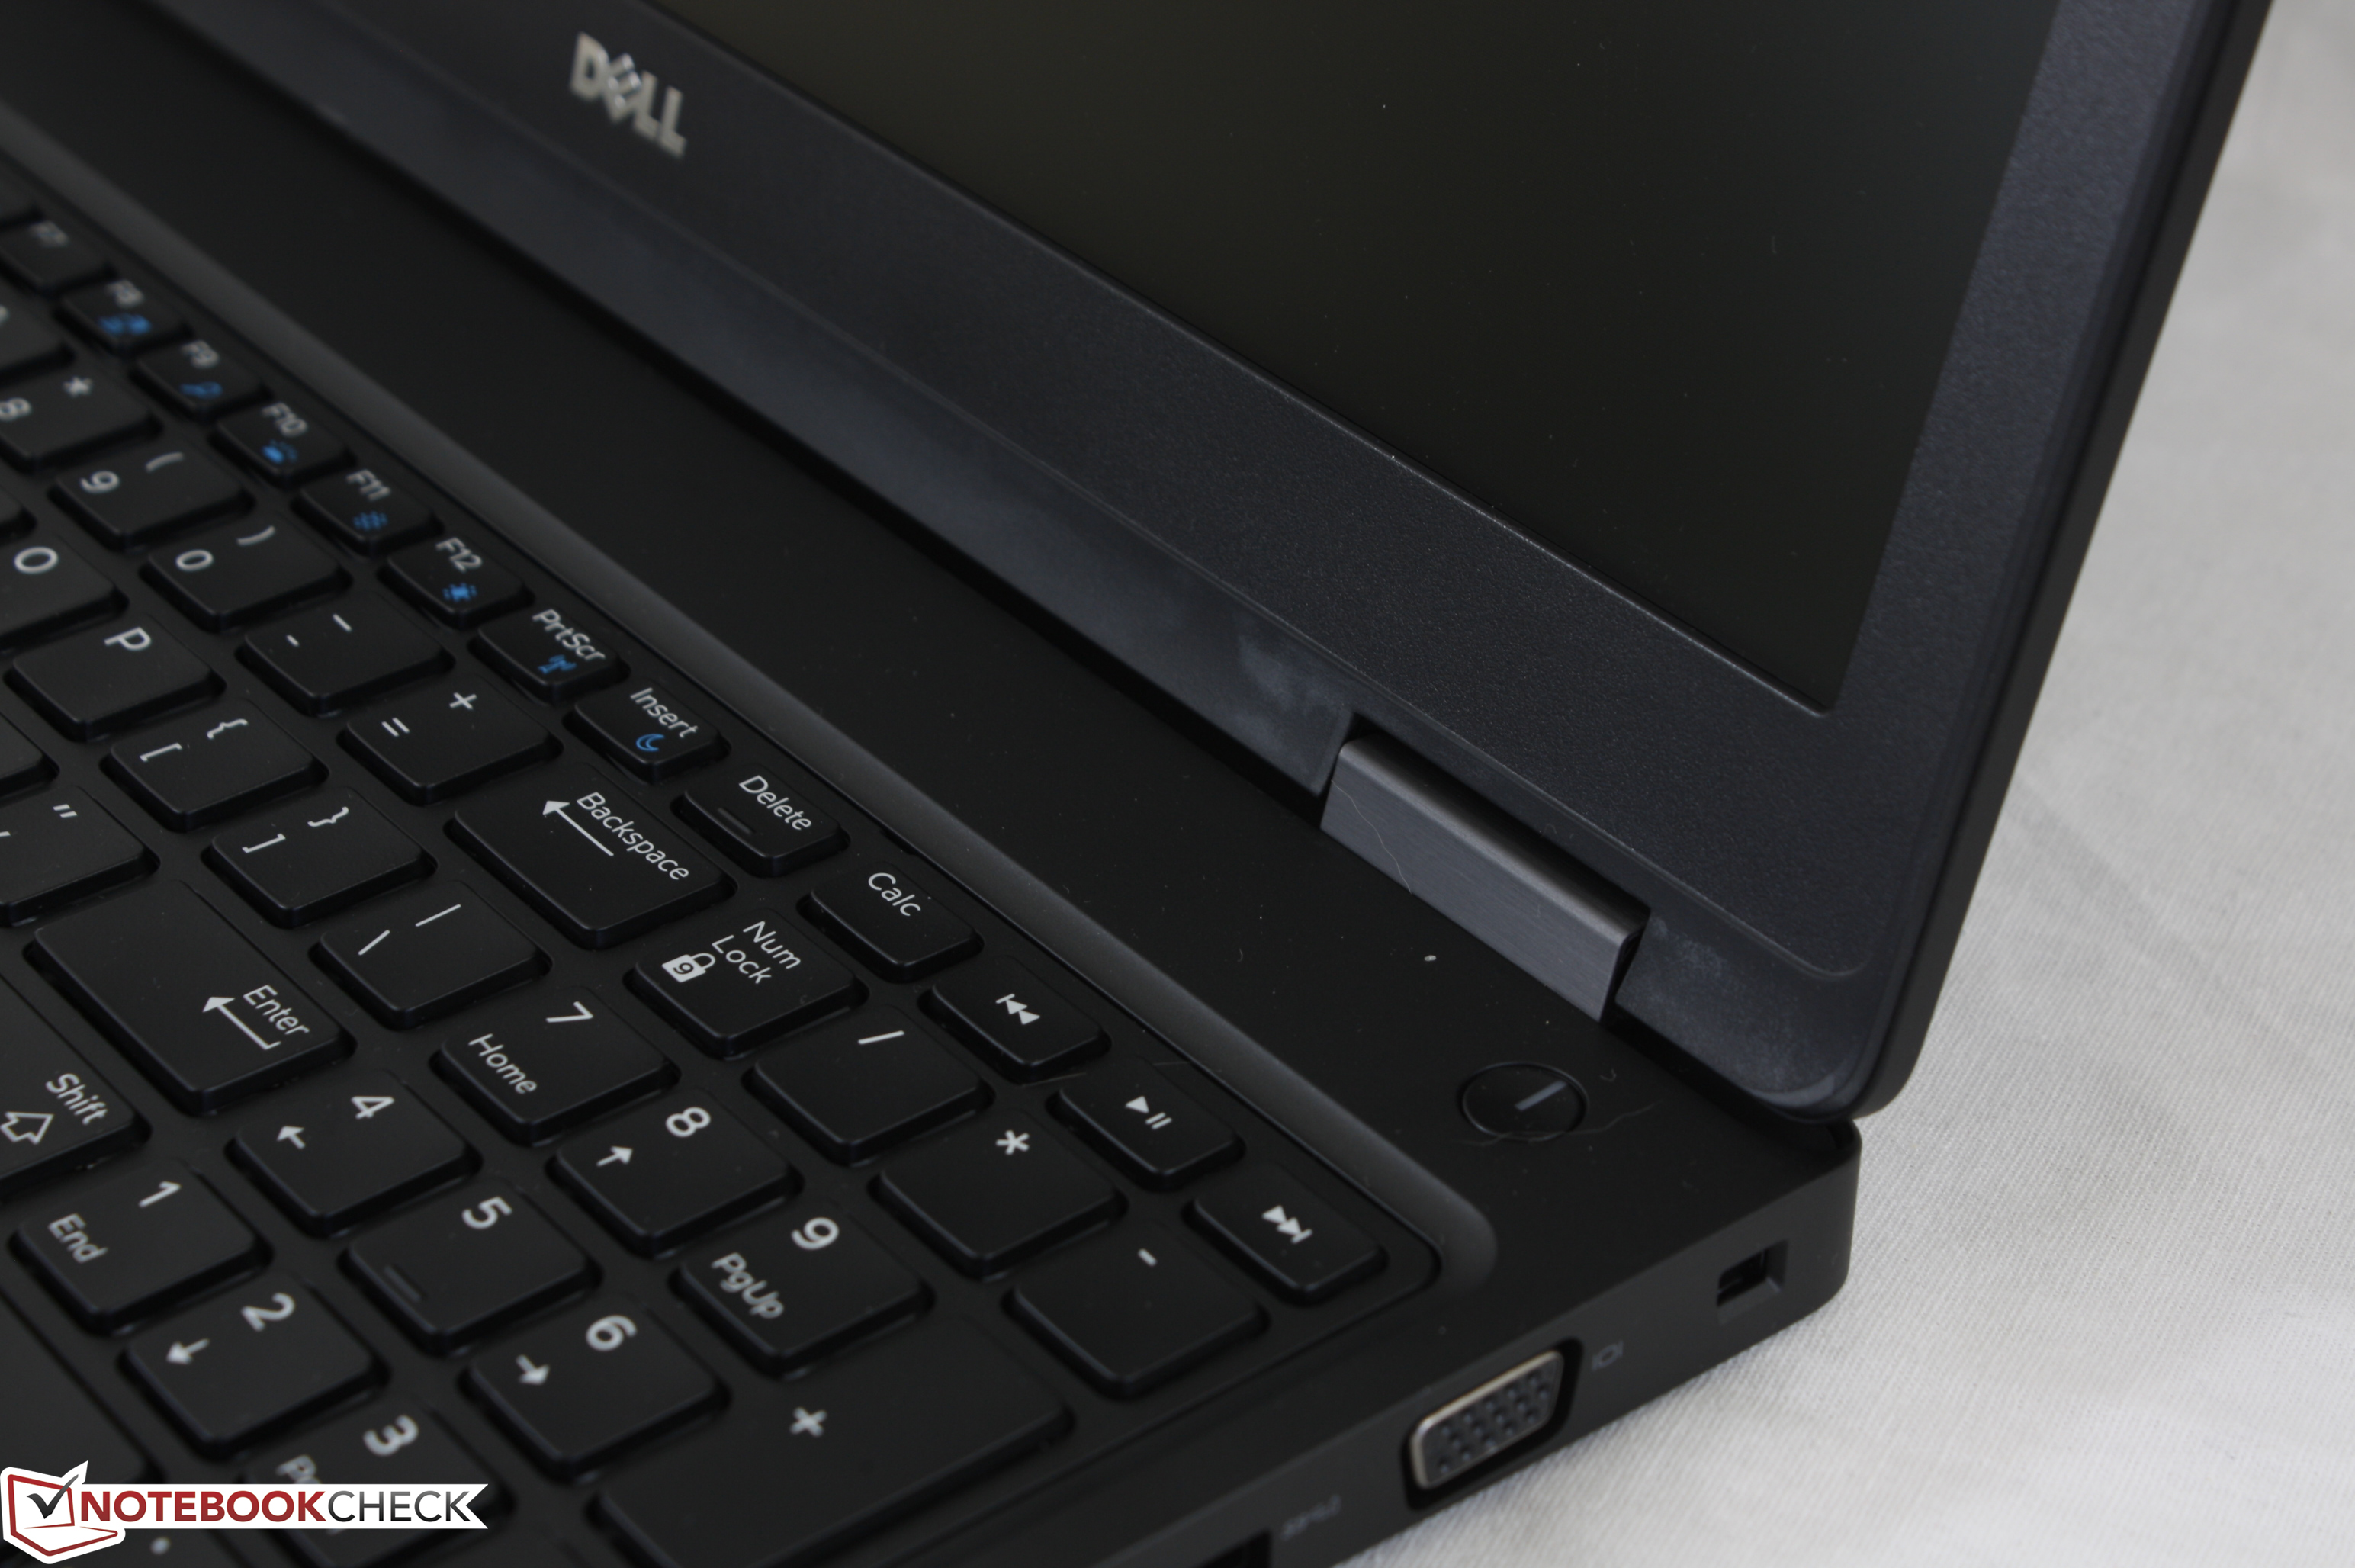 Dell Precision 3520 (i7-7820HQ, M620M) Workstation Review